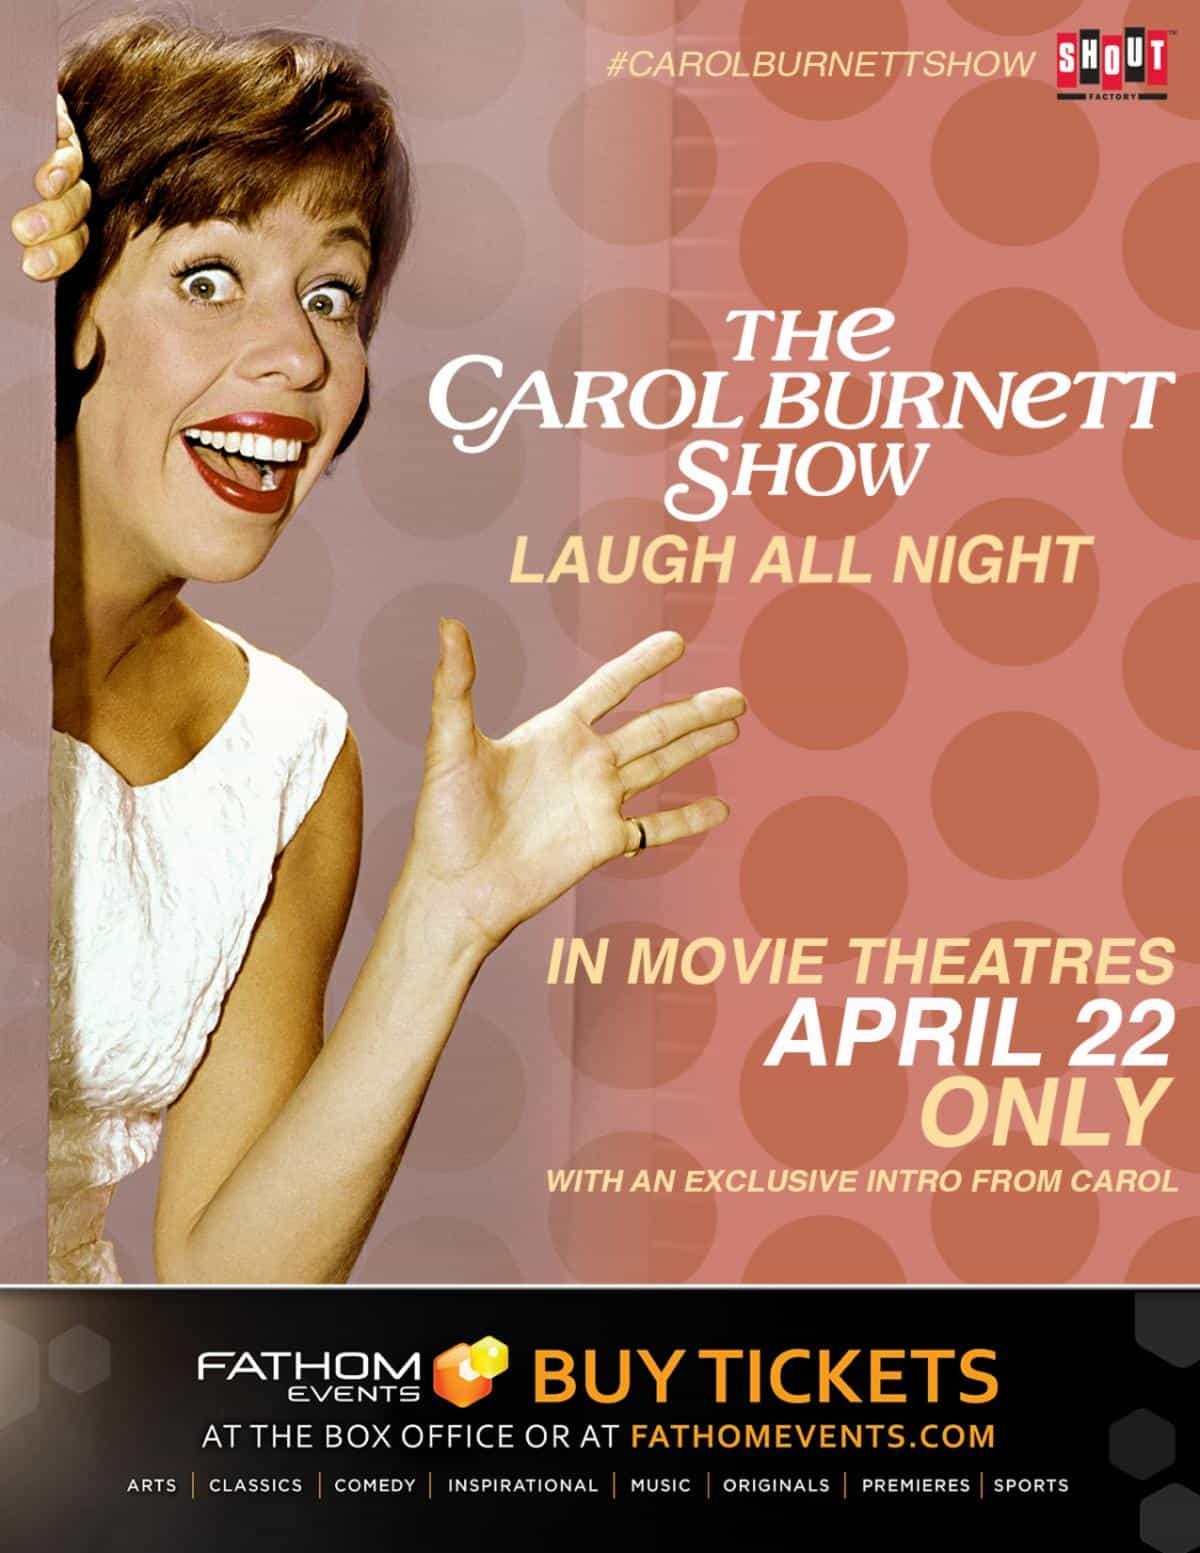 Carol Burnett Show Laugh All Night 2020 poster